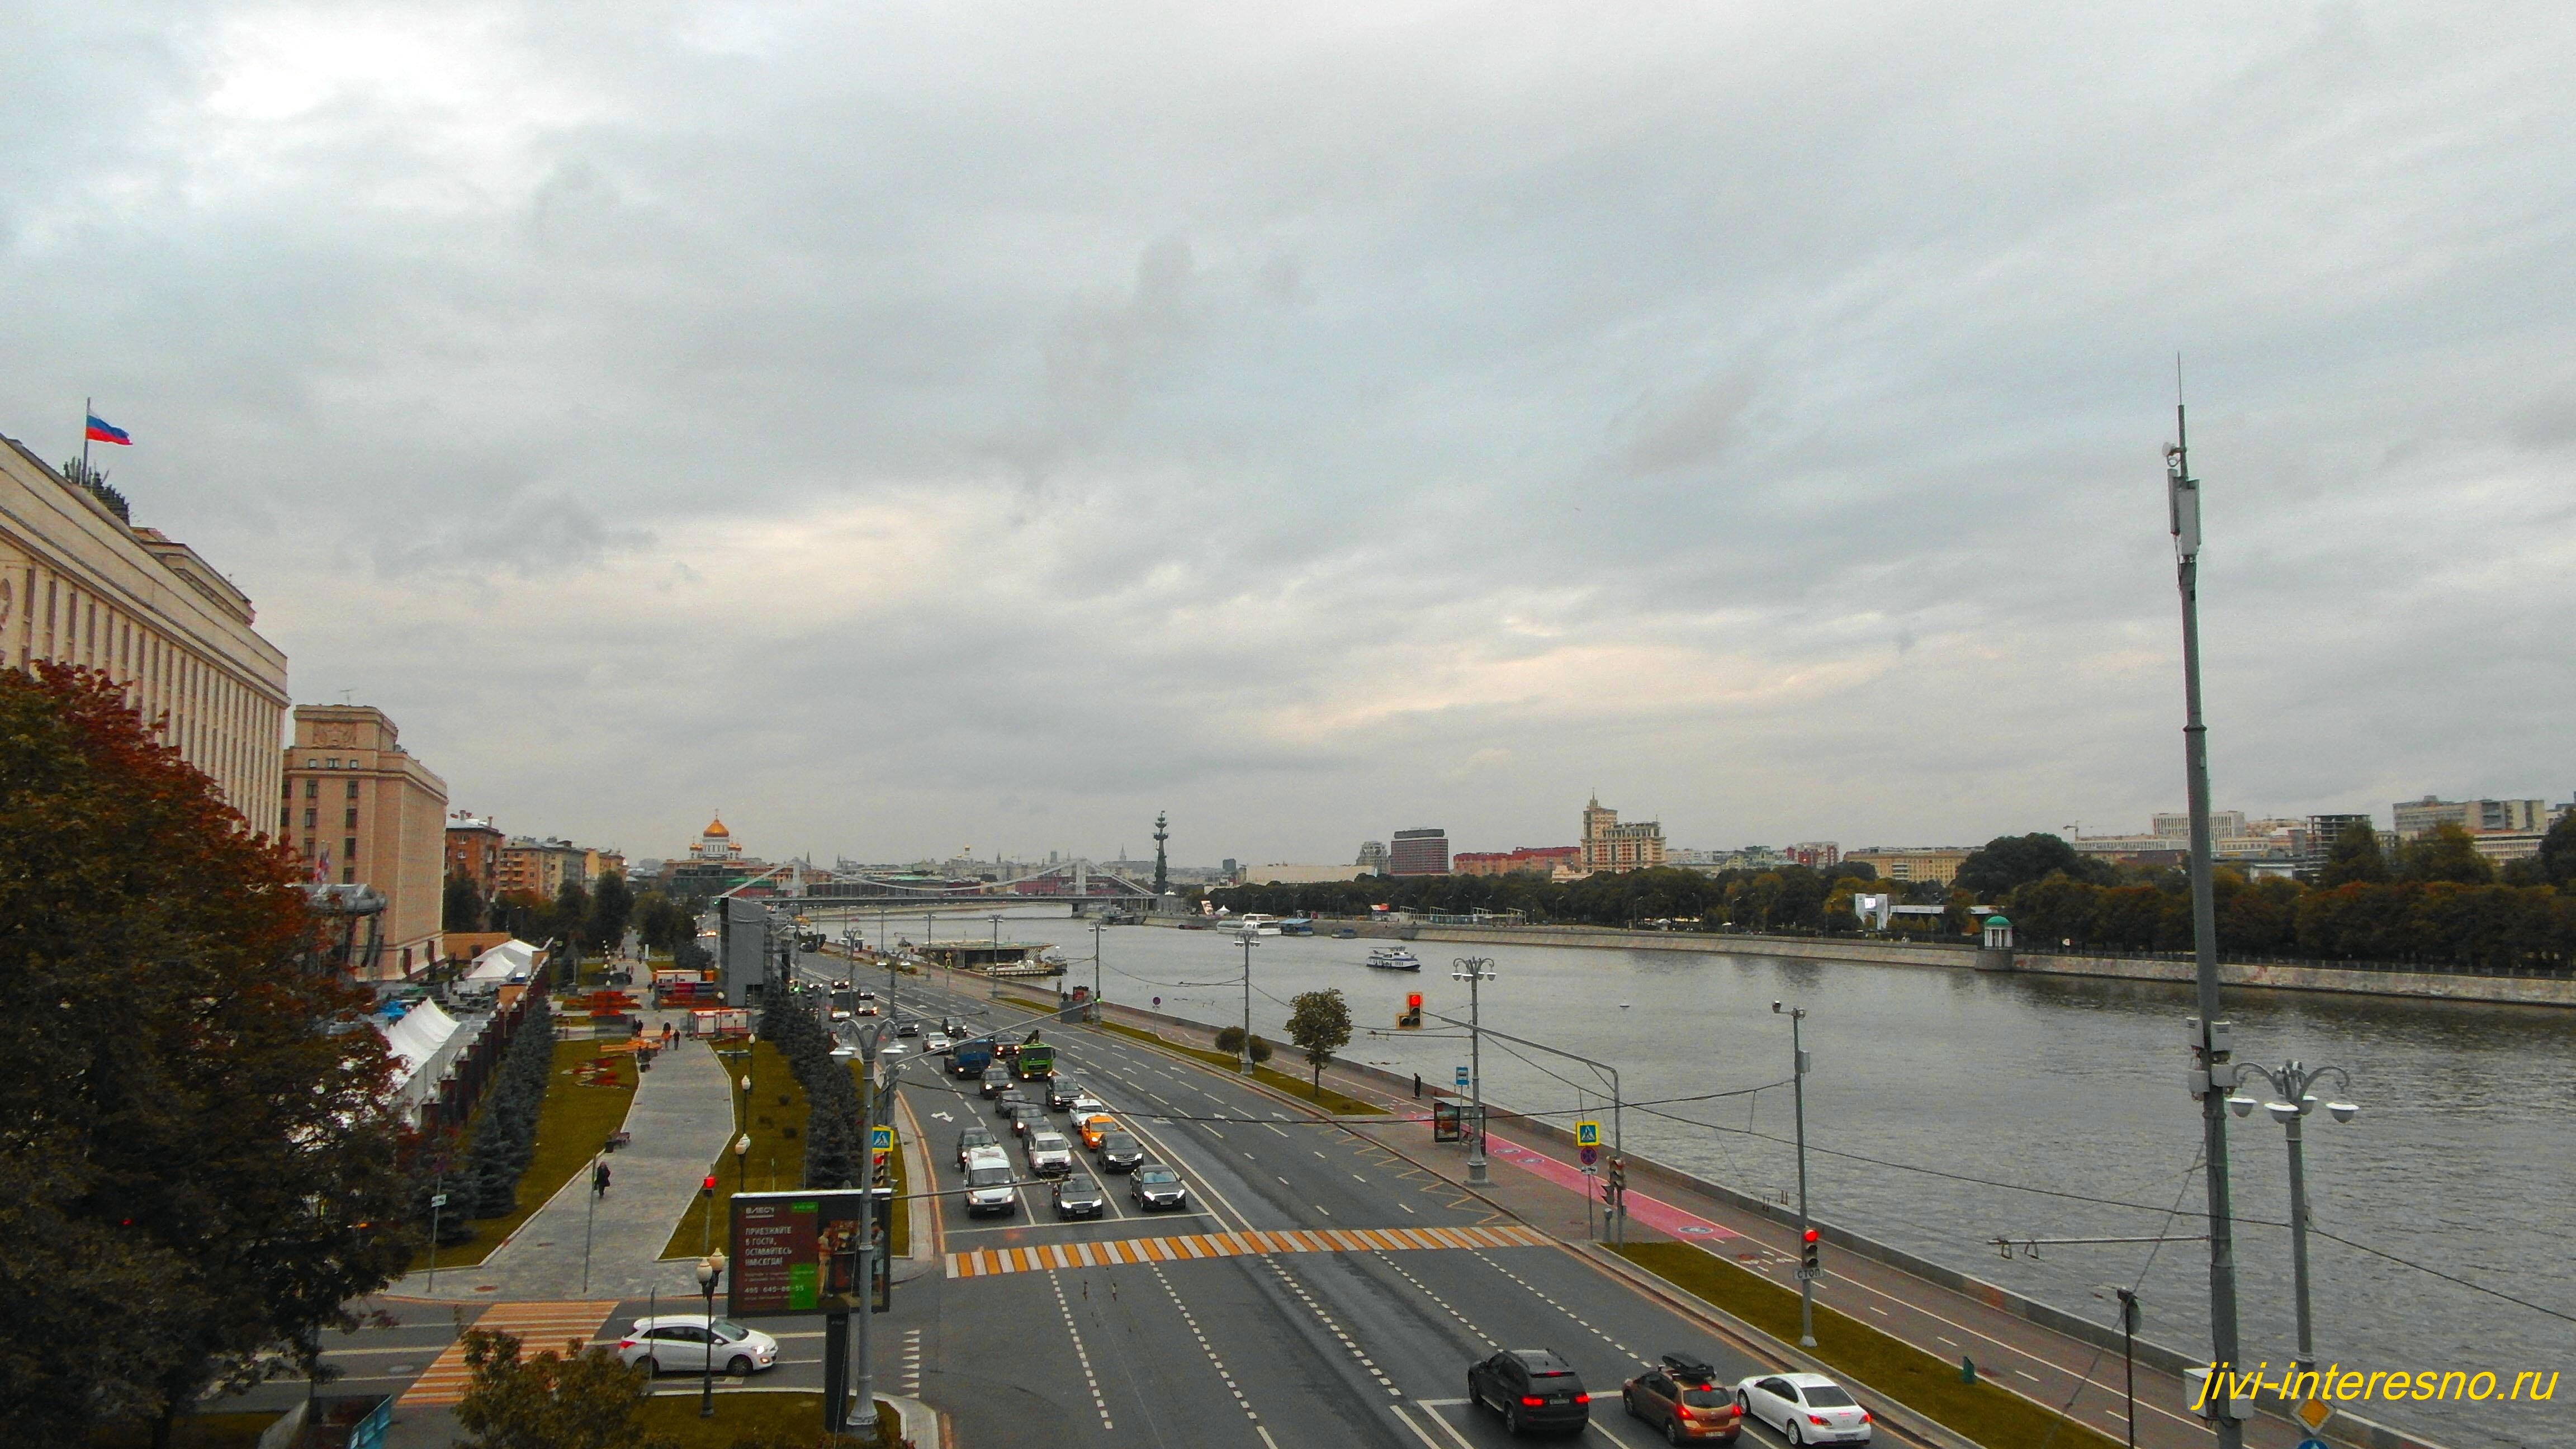 Осенняя Москва, Фрунзенская набережная